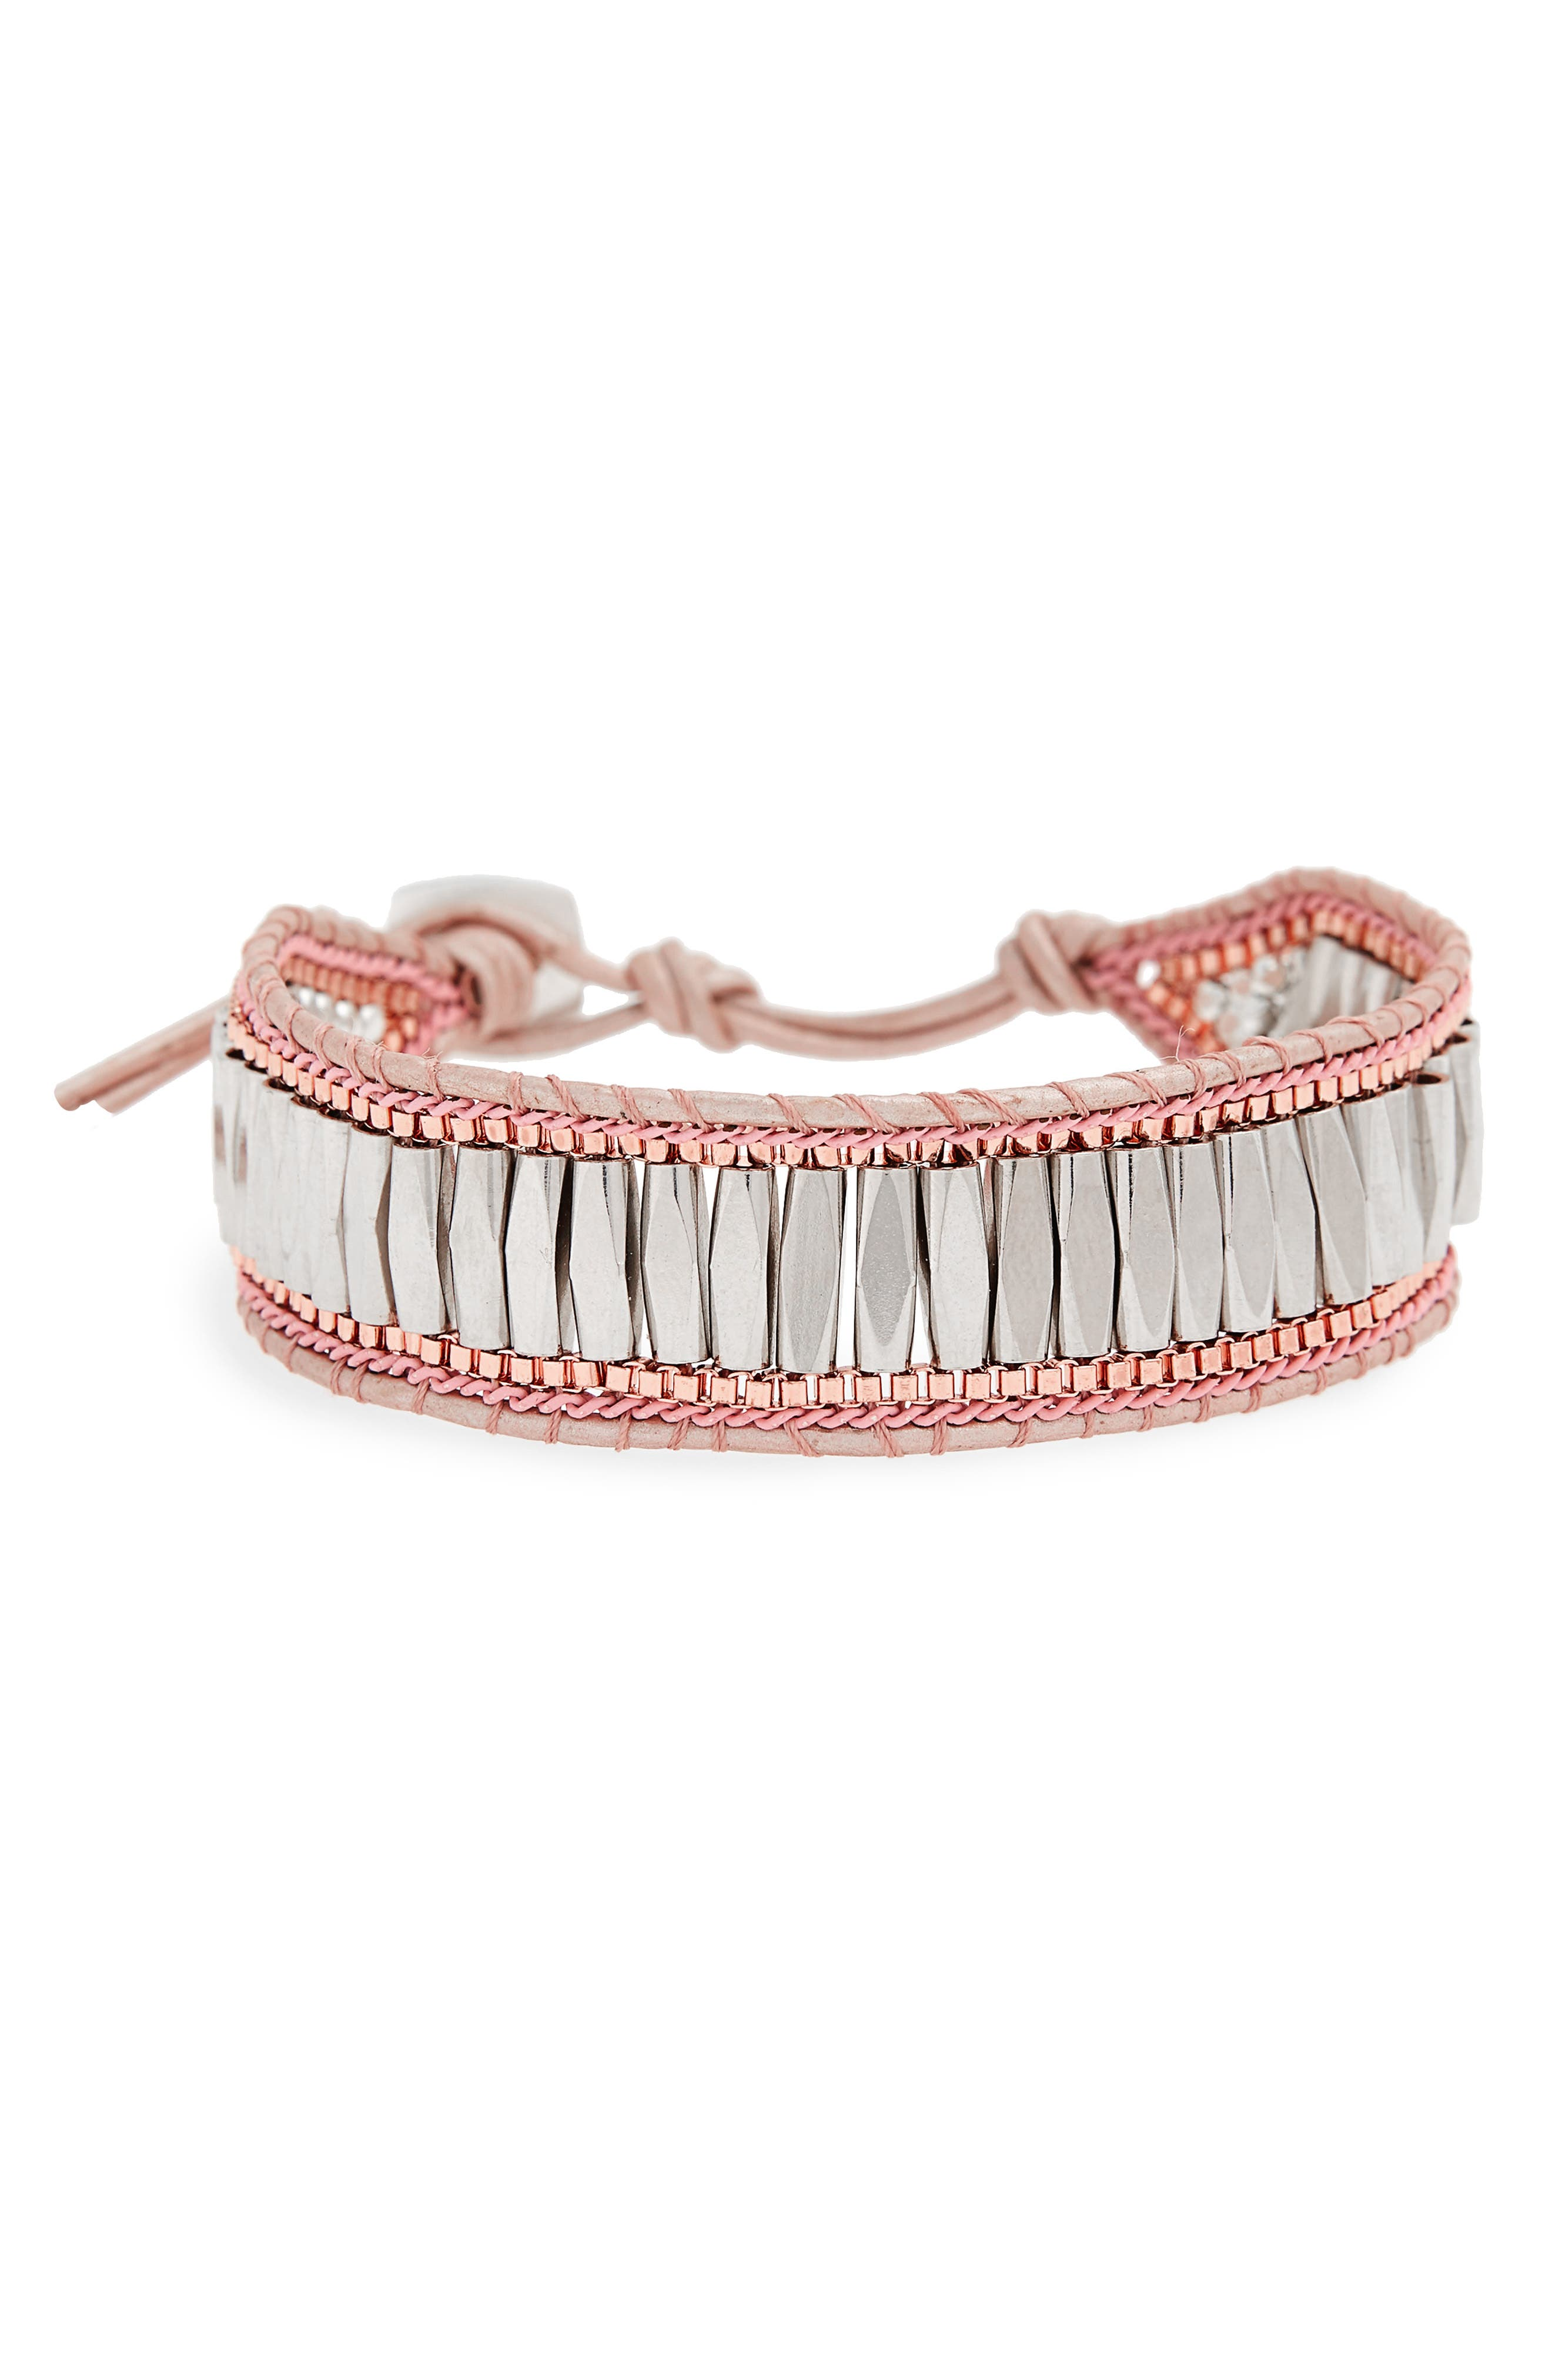 Beaded Leather Bracelet,                             Main thumbnail 1, color,